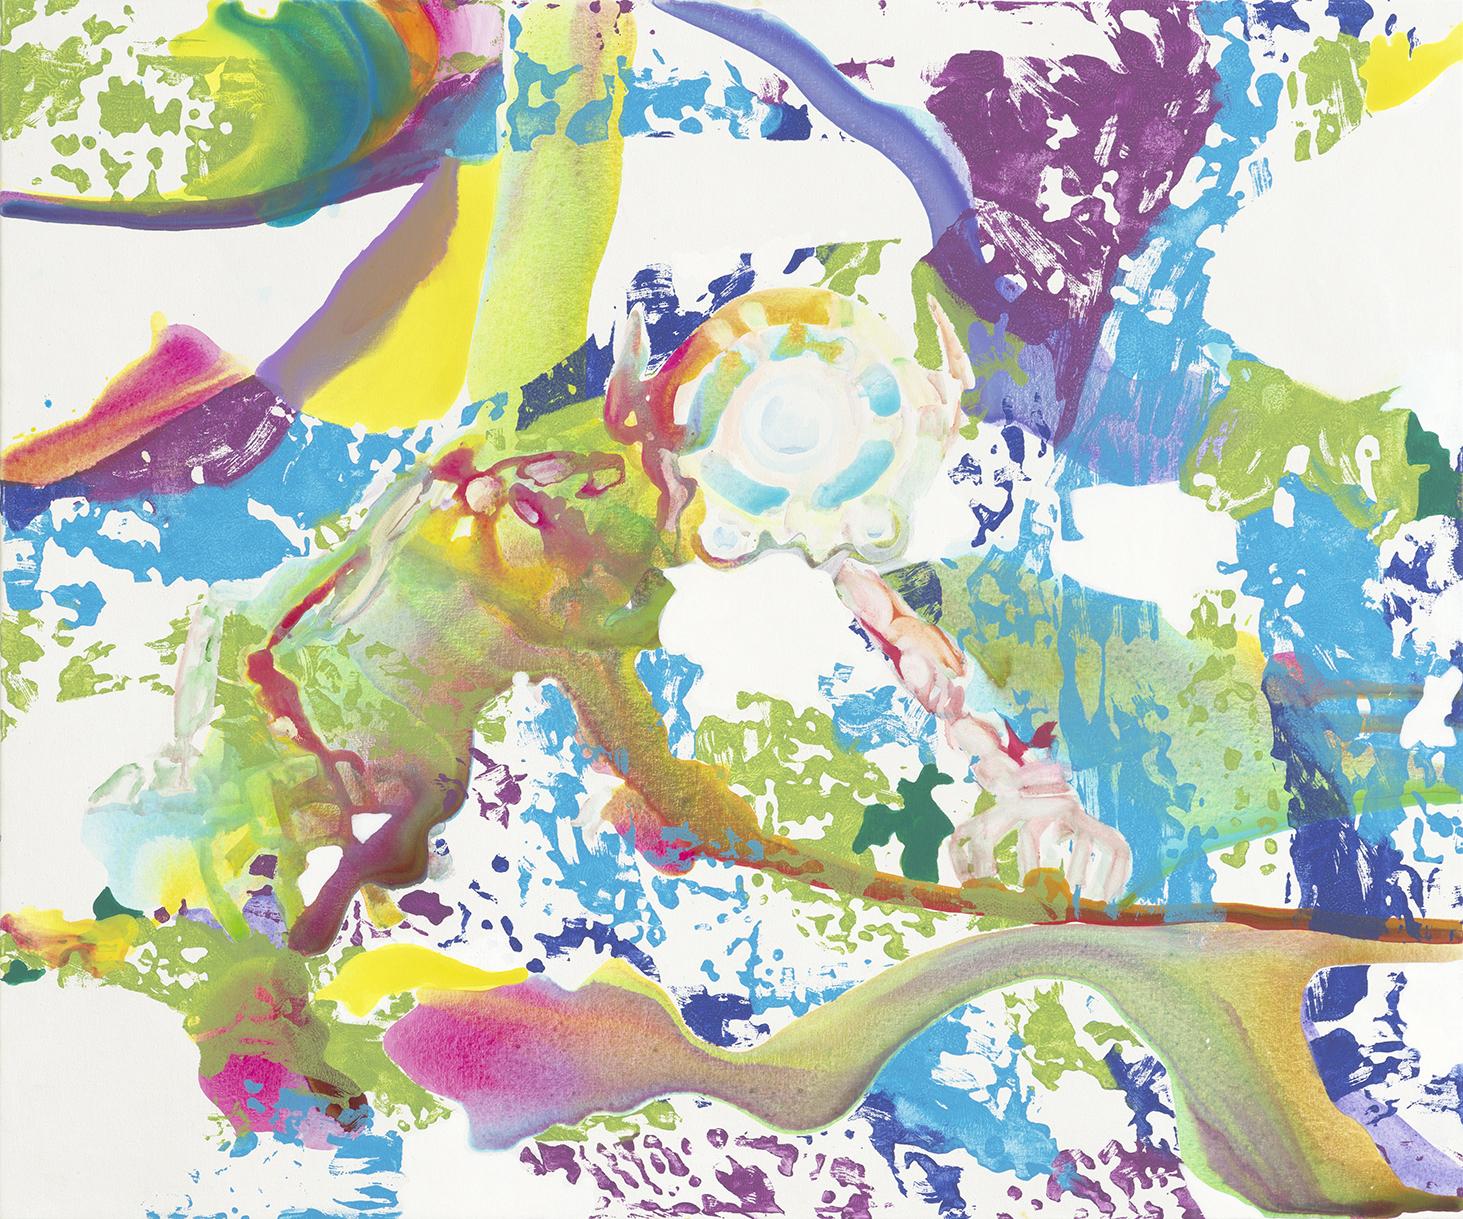 Techcat  | Aquarell, Tusche, Acryl und Linoldruck auf Leinwand | 100 x 120 cm